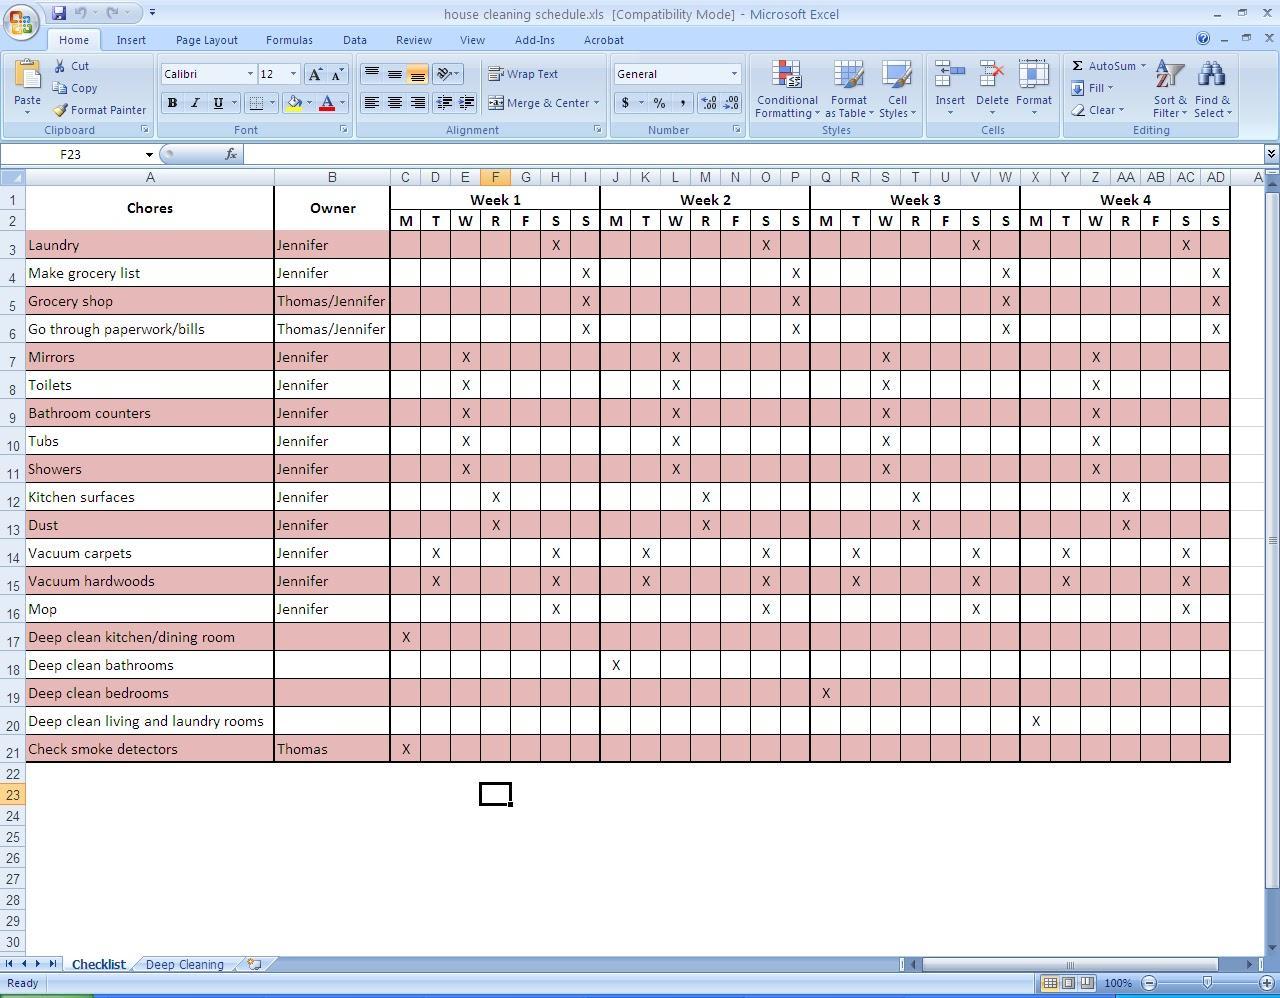 Housekeeping audit templates warehouse mgorka com